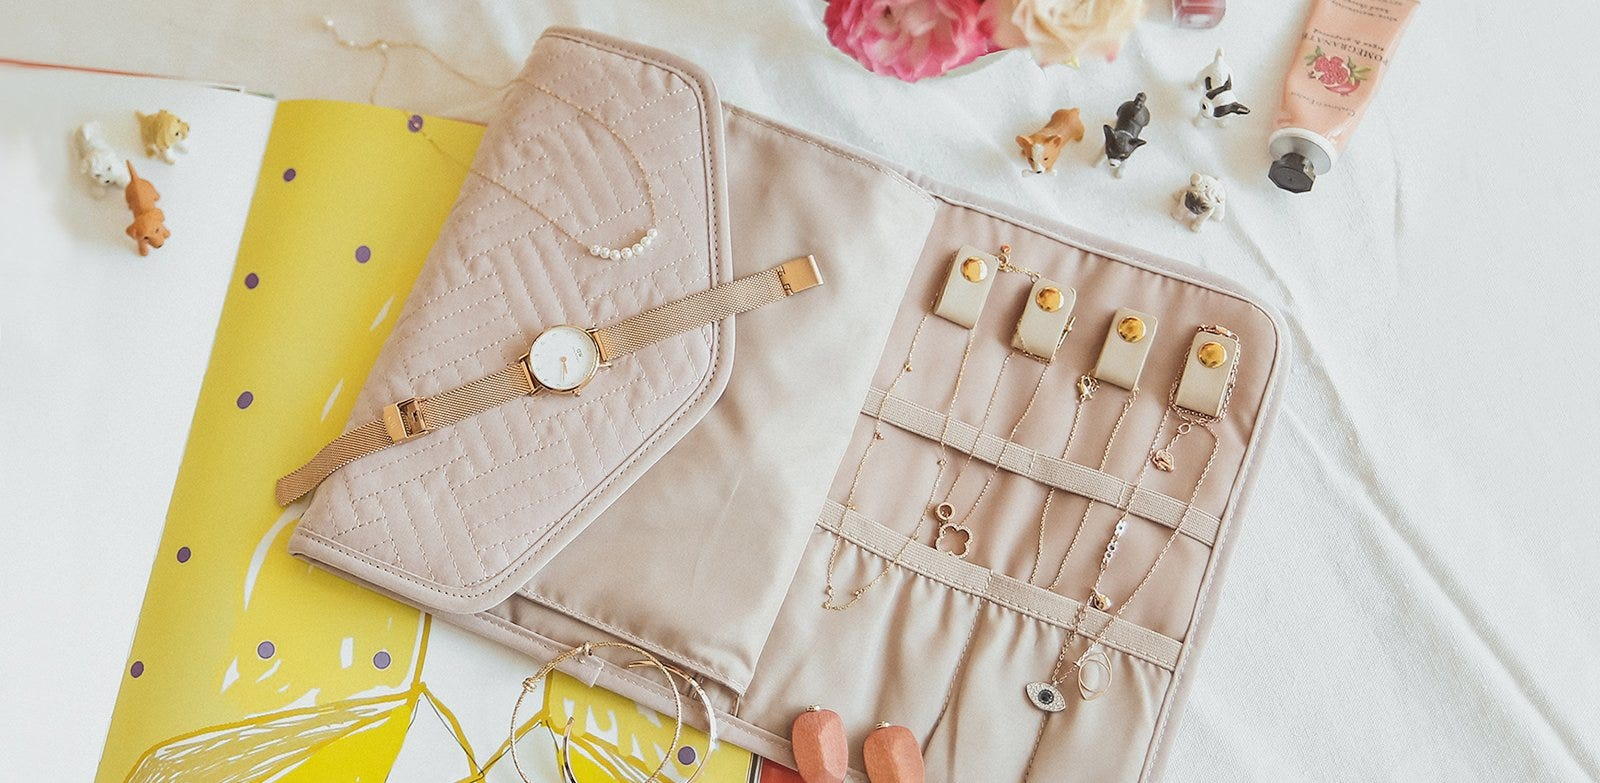 Folding jewelry case open to show jewelry inside.